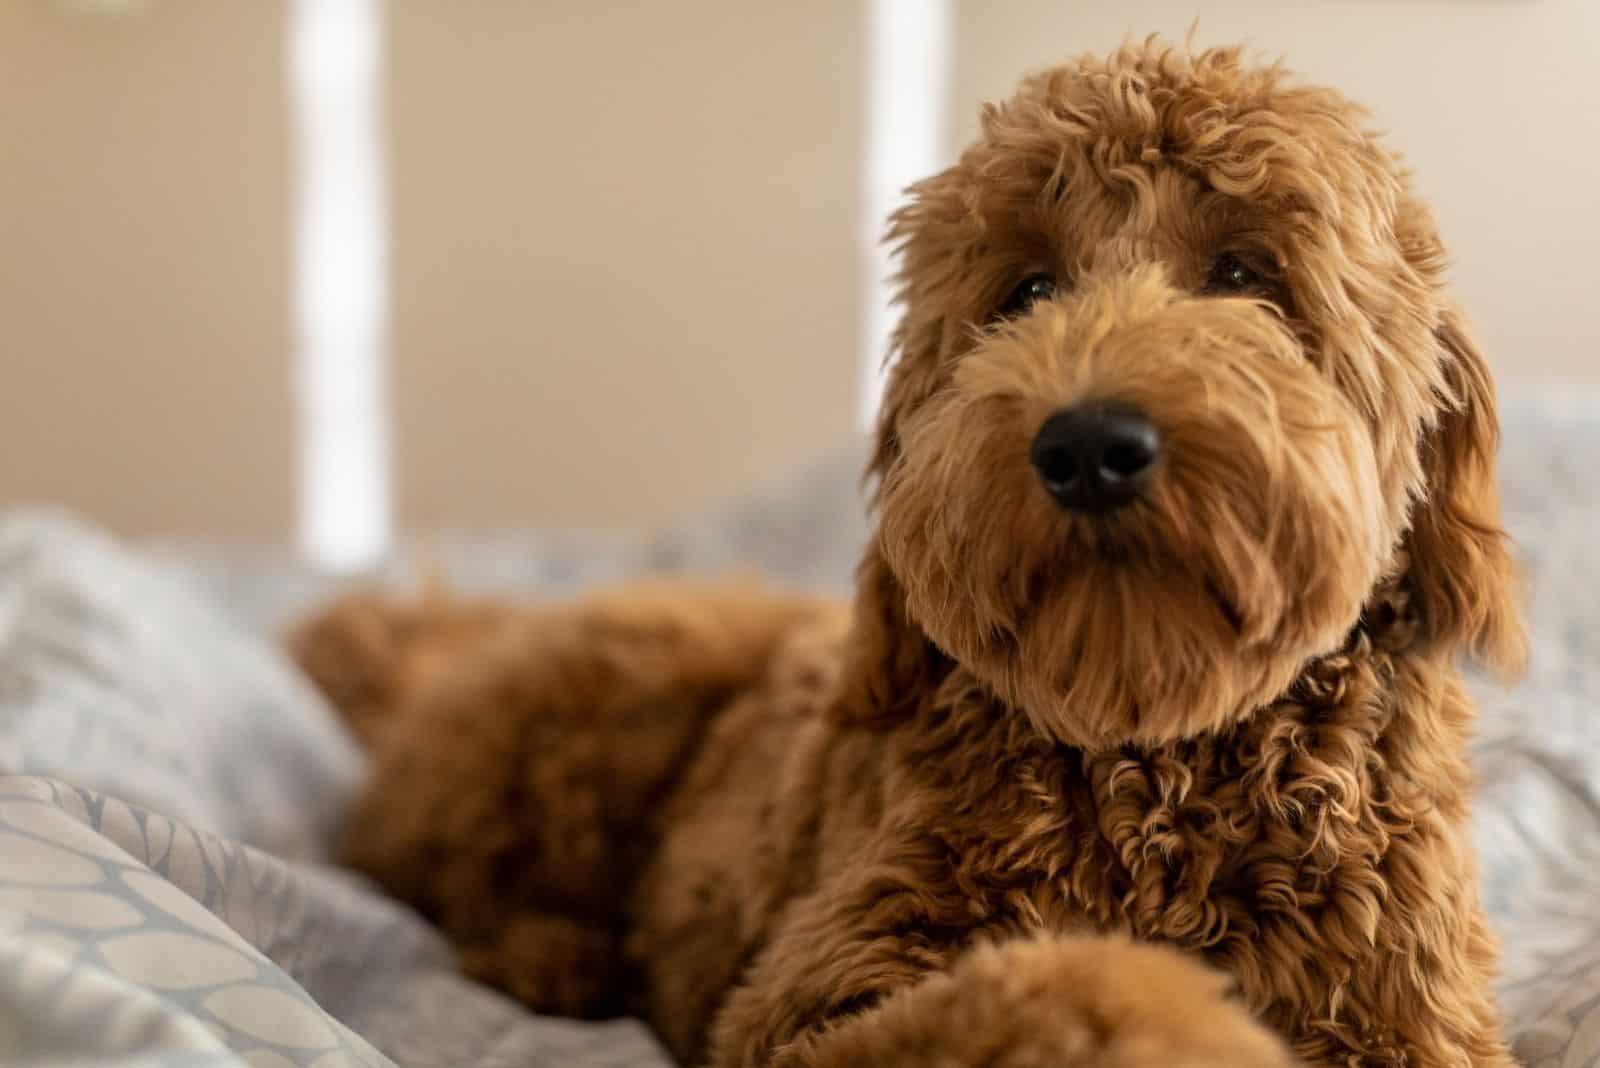 goldendoodle portrait lying down in bed inside bedroom